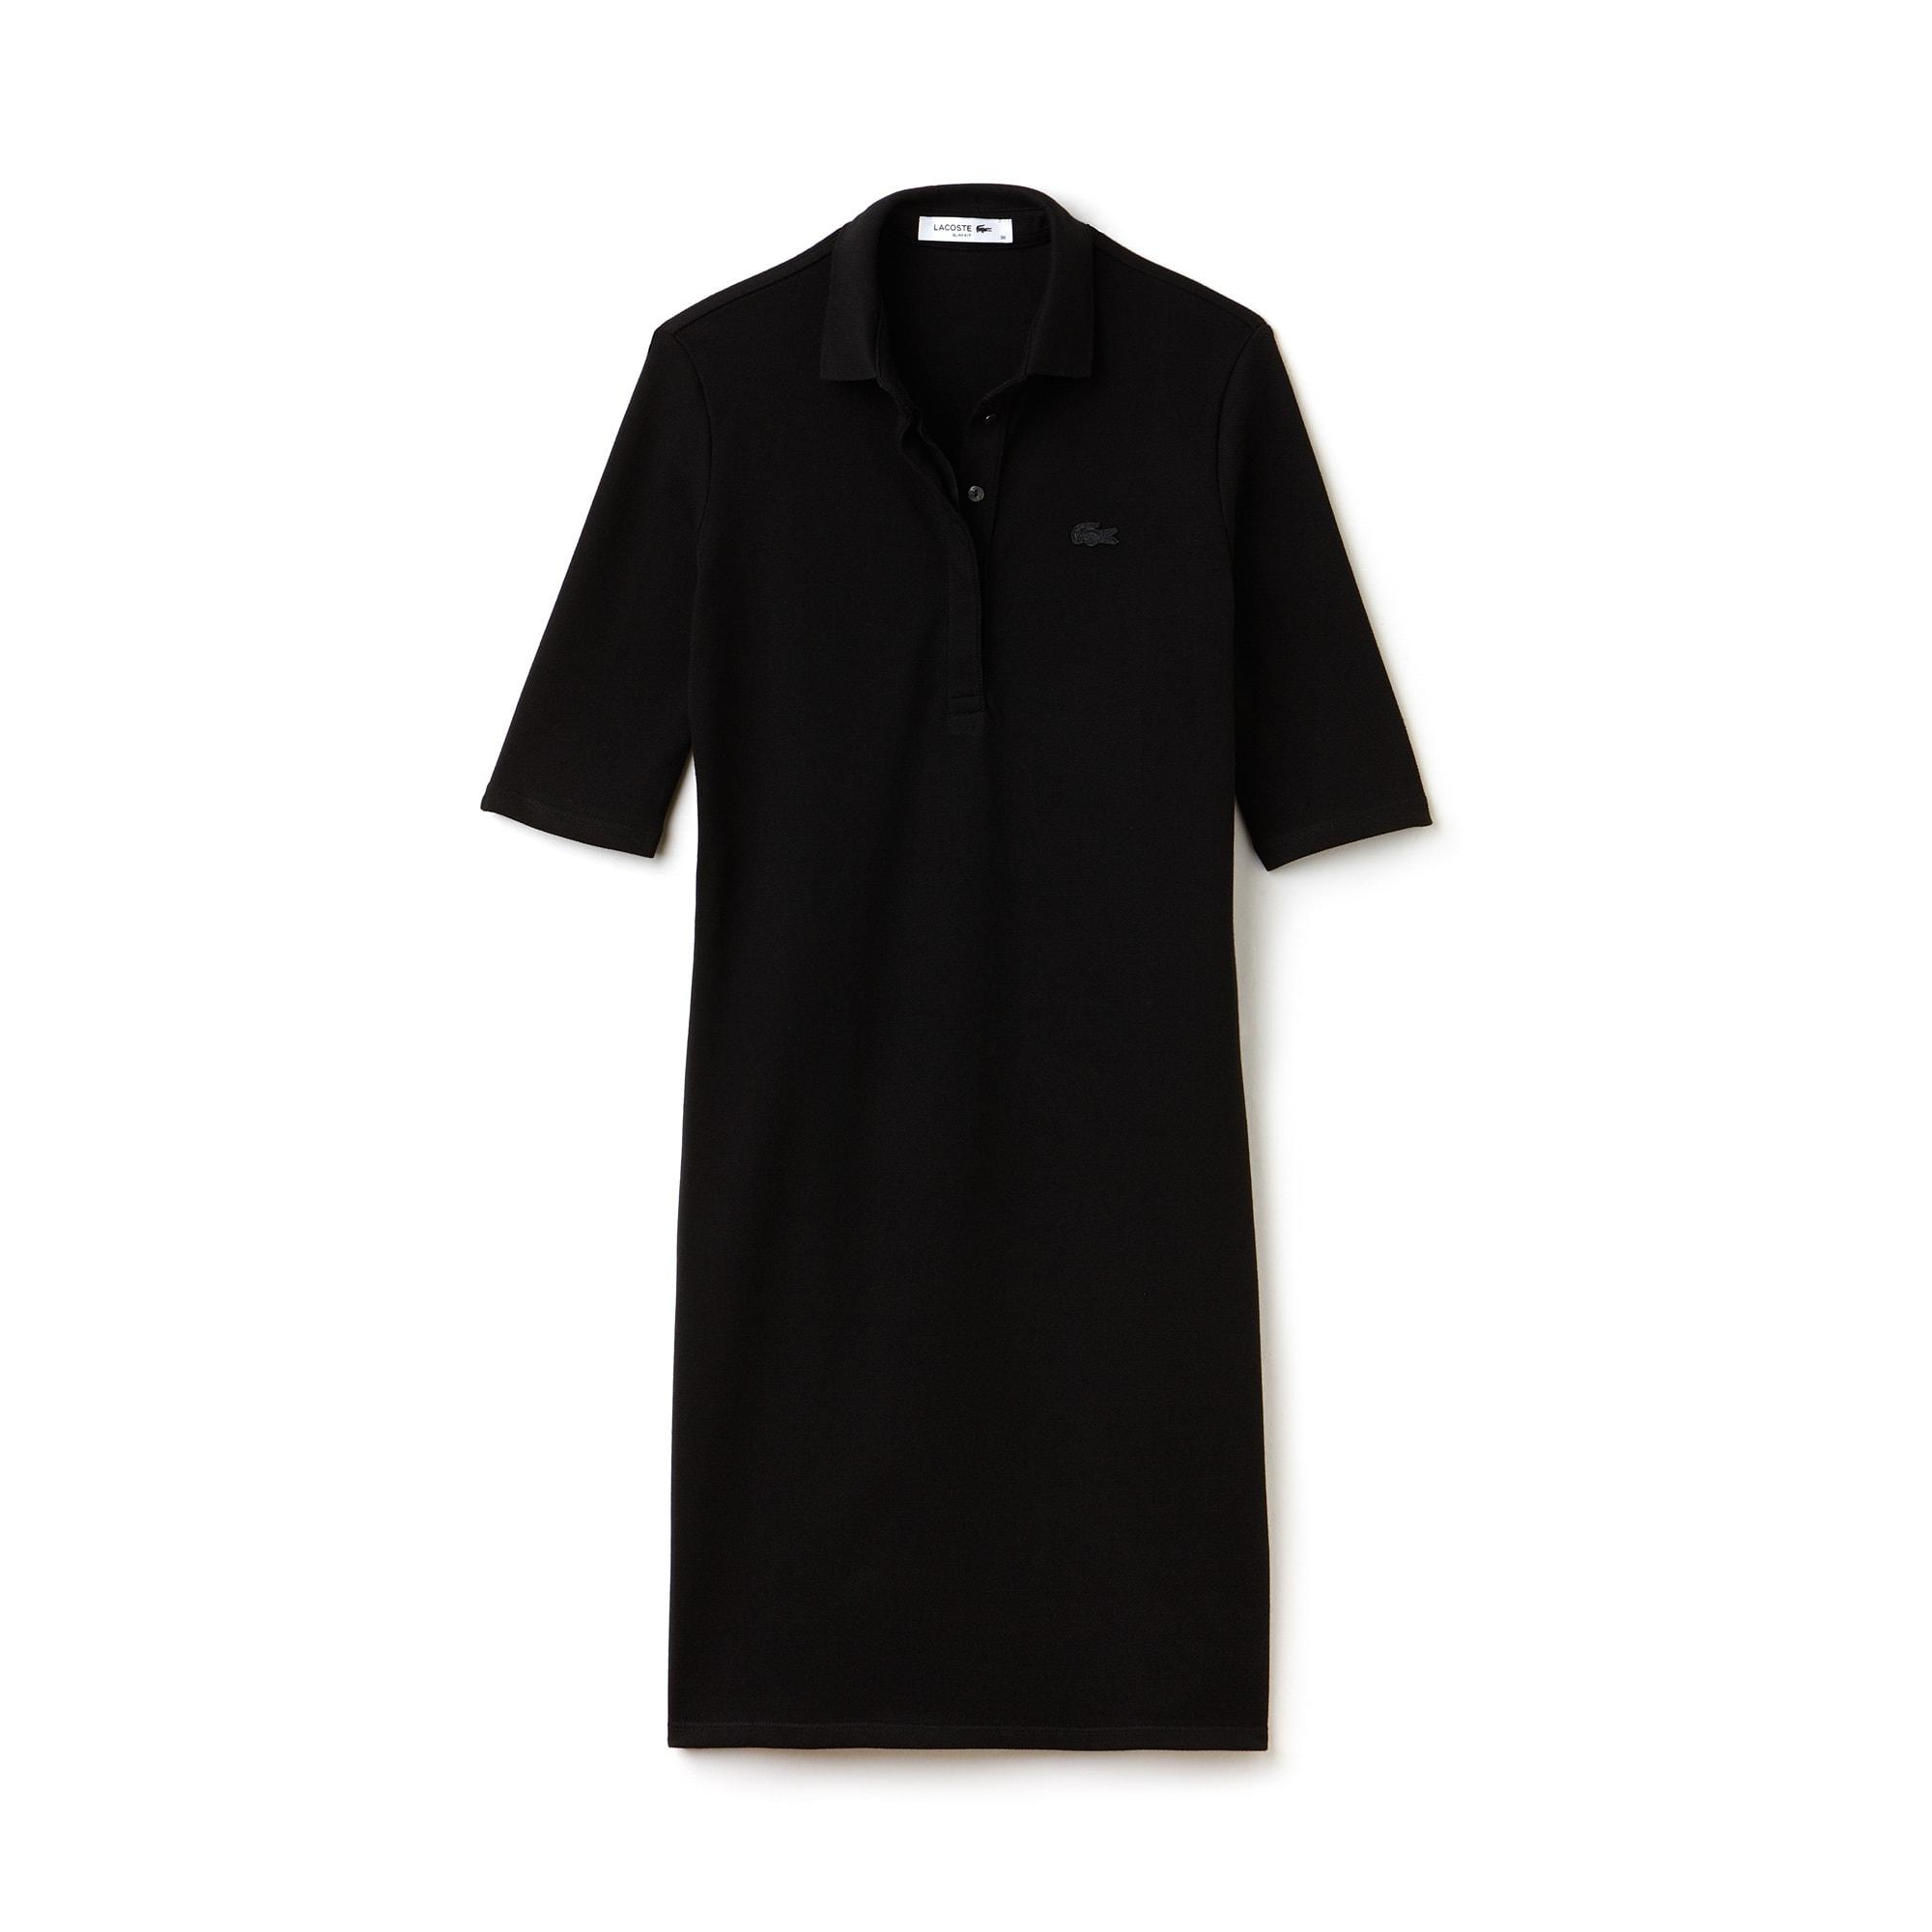 Women's Thick Stretch Cotton Piqué Polo Dress